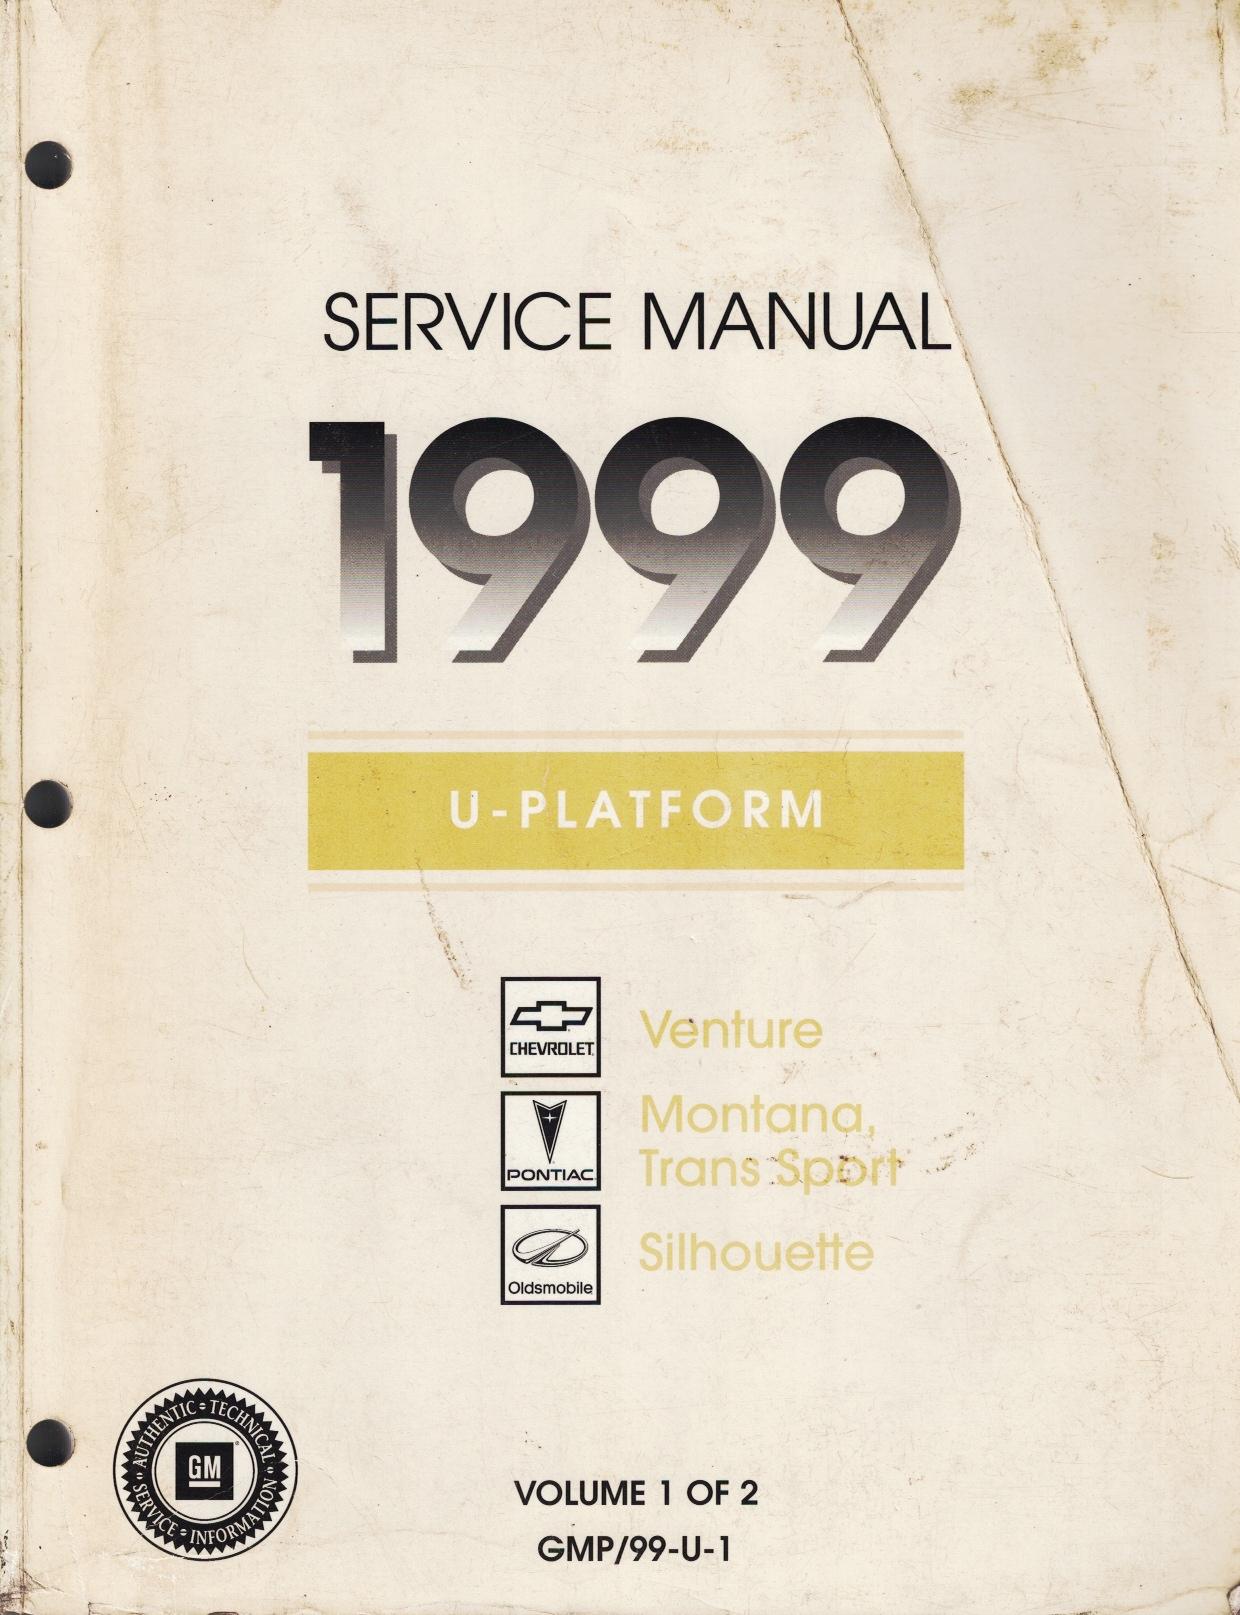 Image for 1999 U-Platform - Chevrolet Venture, Pontiac Montana, Trans Sport, Oldsmobile Silhouette Service Manual (2 Volume Set)